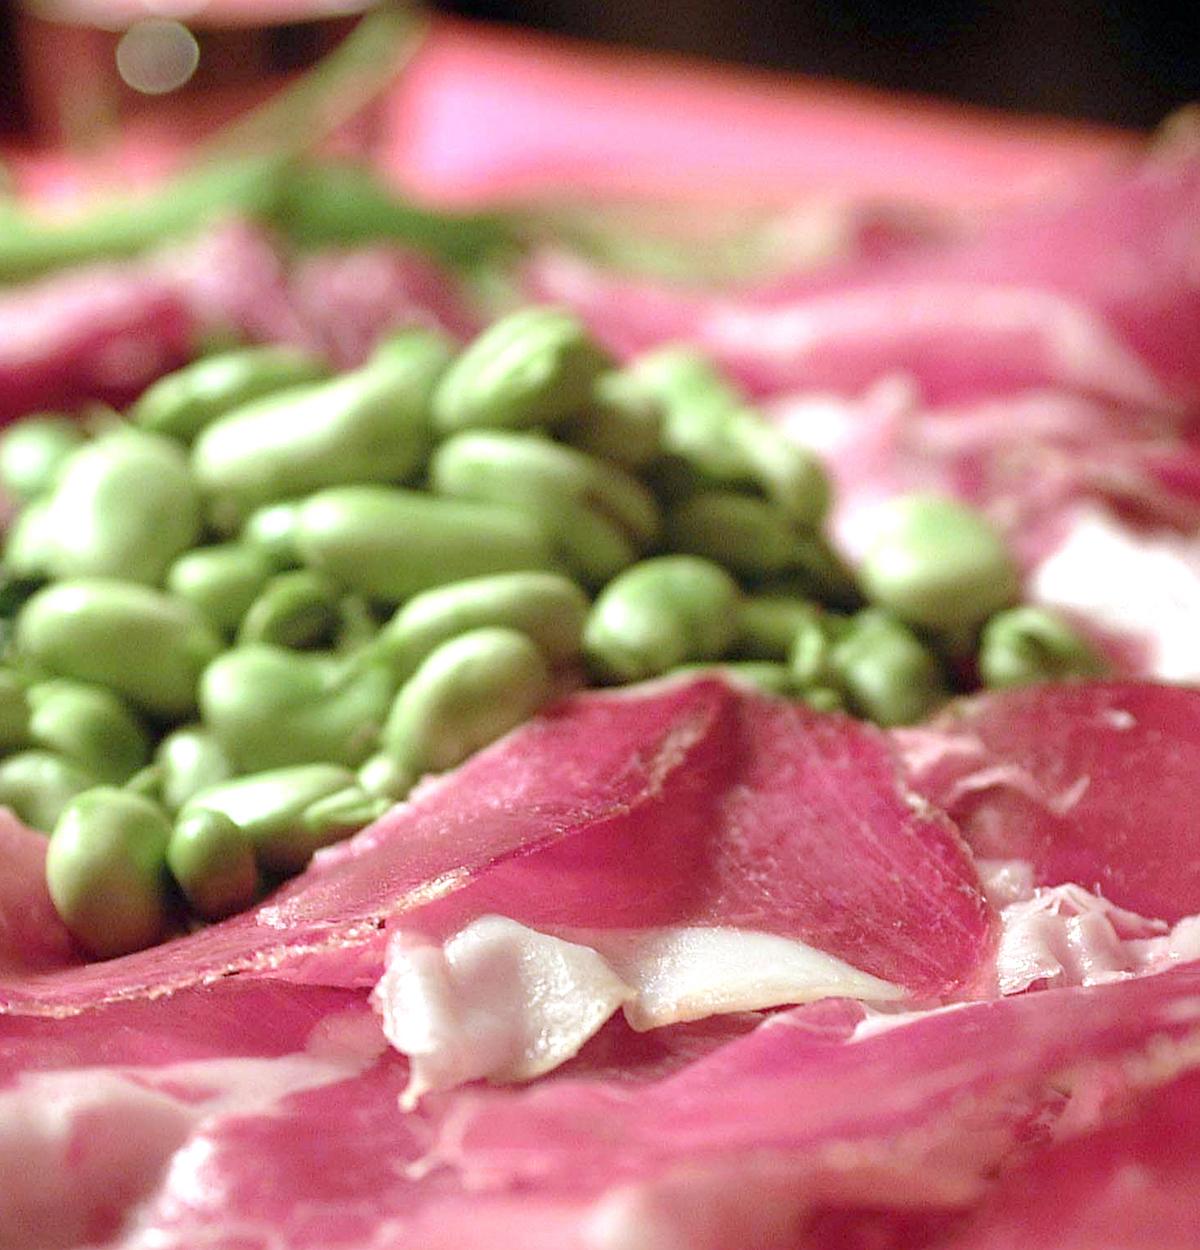 Fèves et jambon ©simona flamigni shutterstock